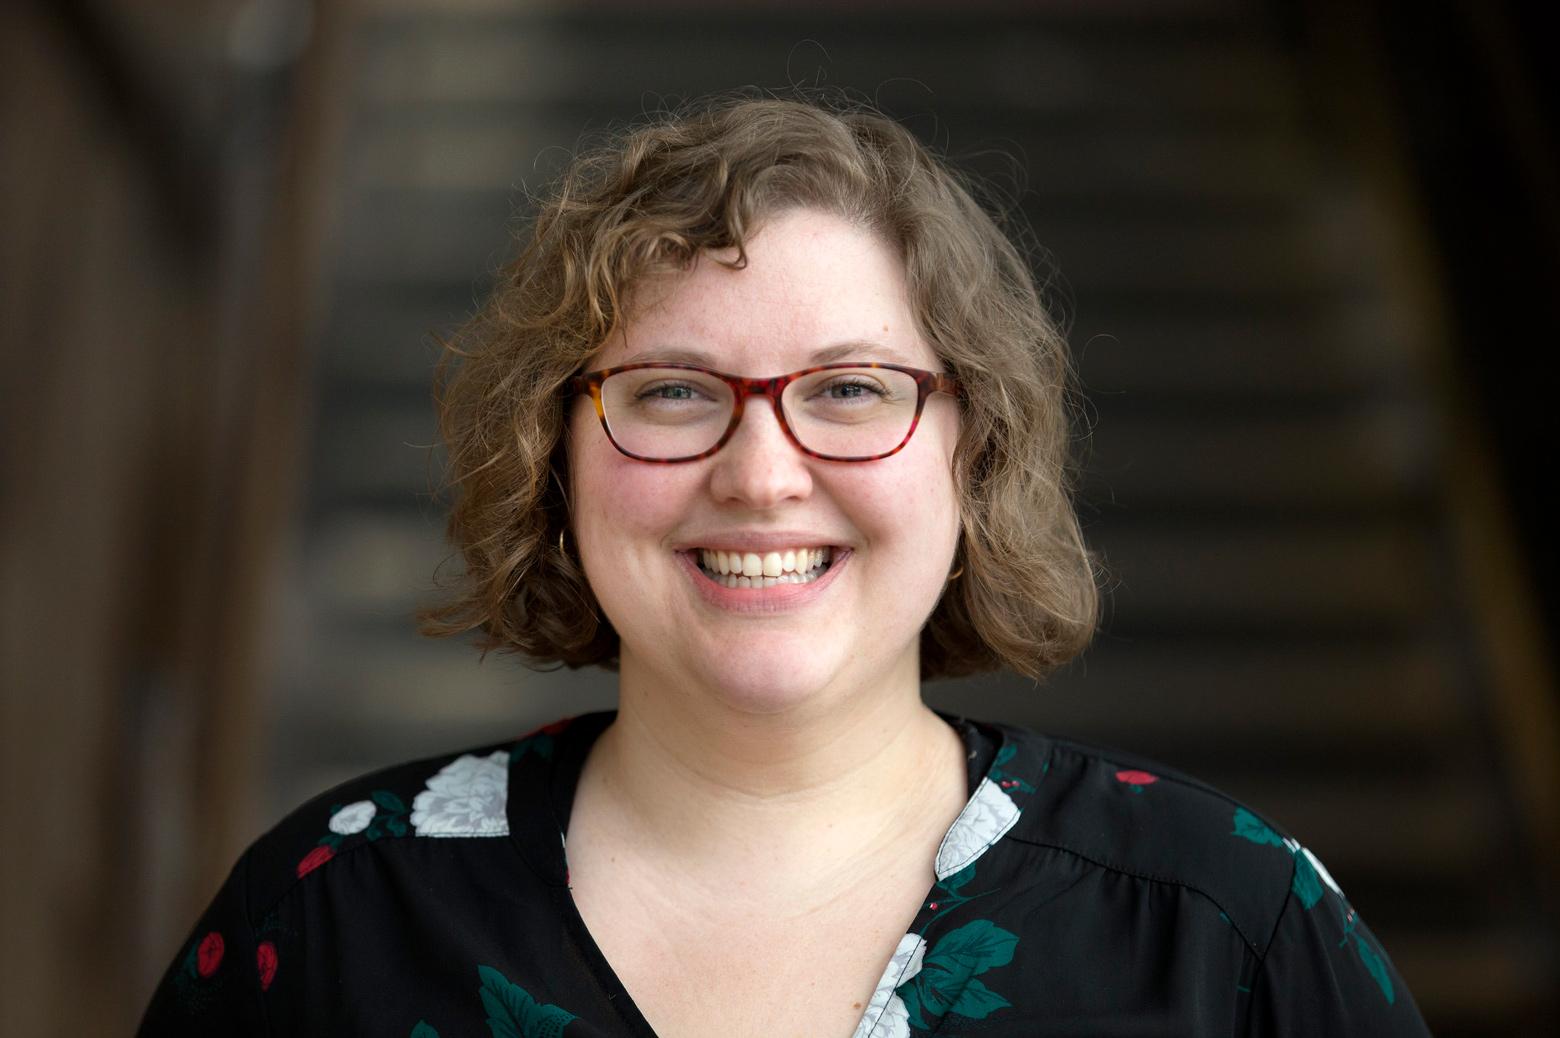 Ruthie Freeman, professional development program manager in Resource Planning and Management at Michigan Engineering. Photo: Somya Bhagwagar/Michigan Engineering